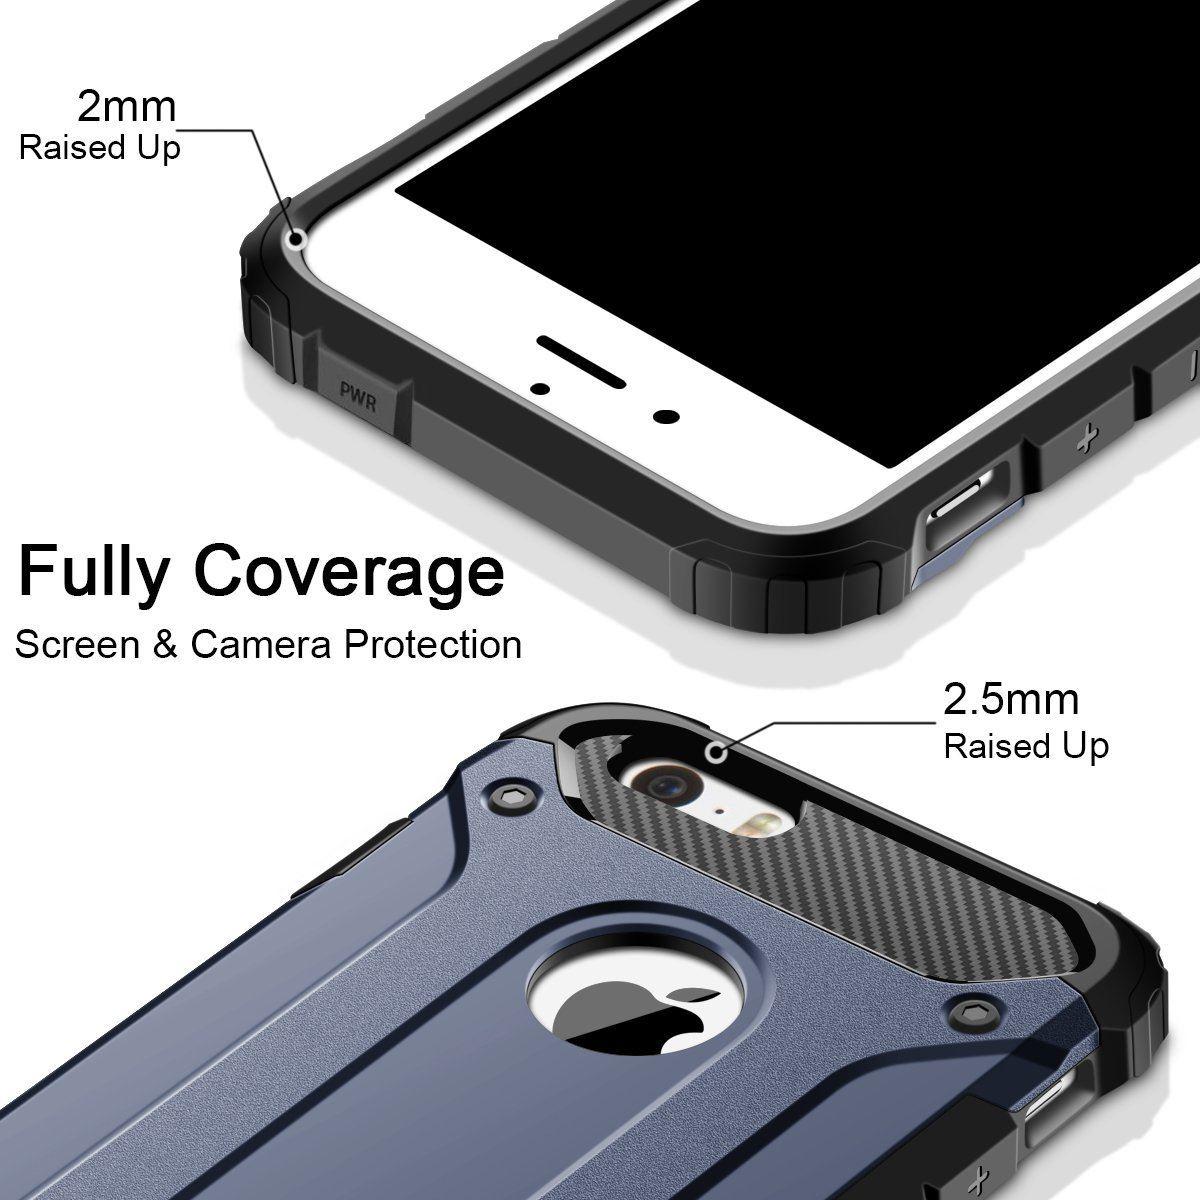 thumbnail 30 - For Apple iPhone 11 Pro Max XR Xs X 8 7 Plus 6 5 Se Case Cover Tough Armor